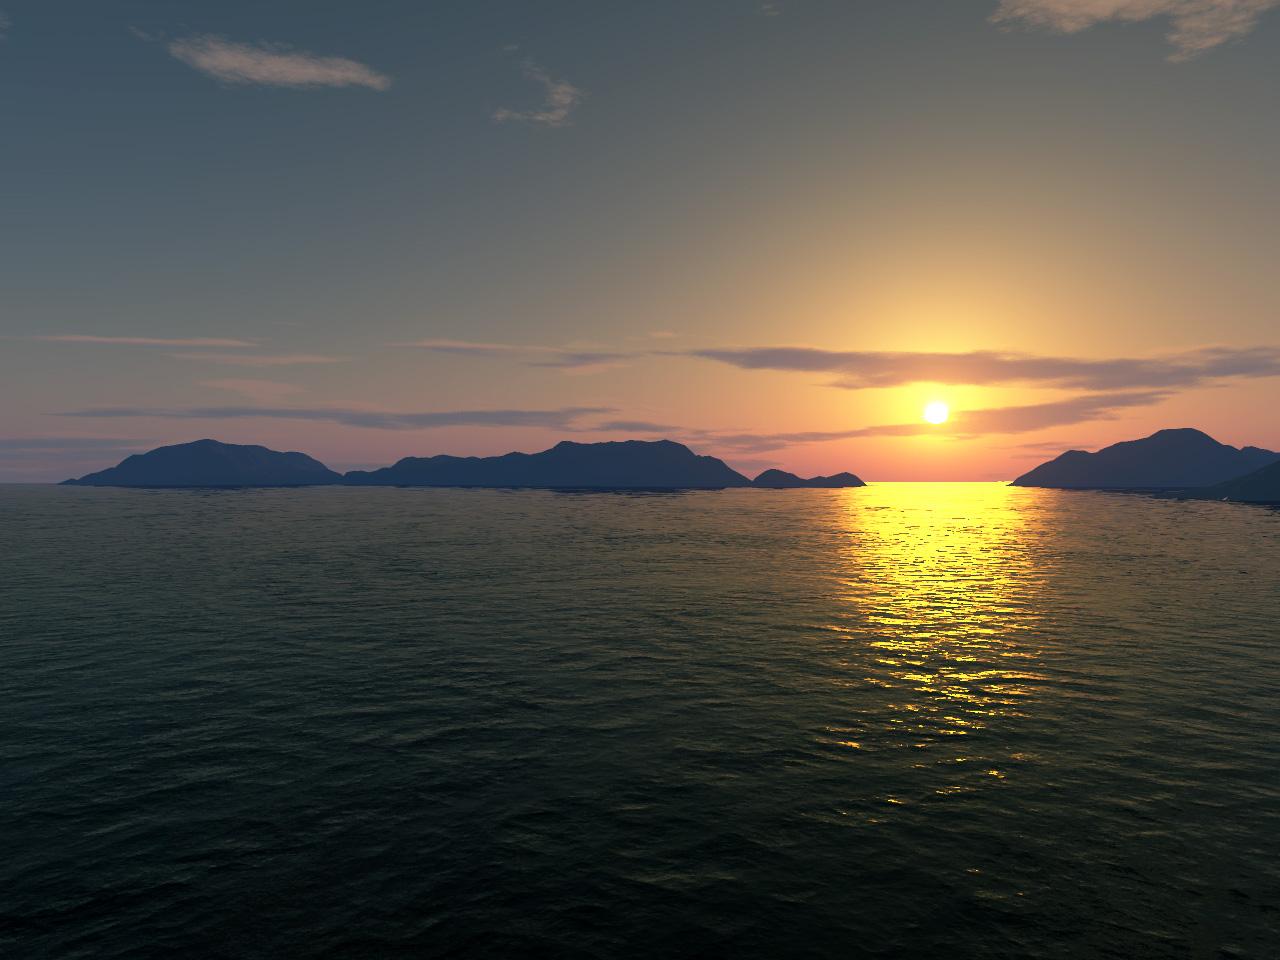 Bubblecube's sunset